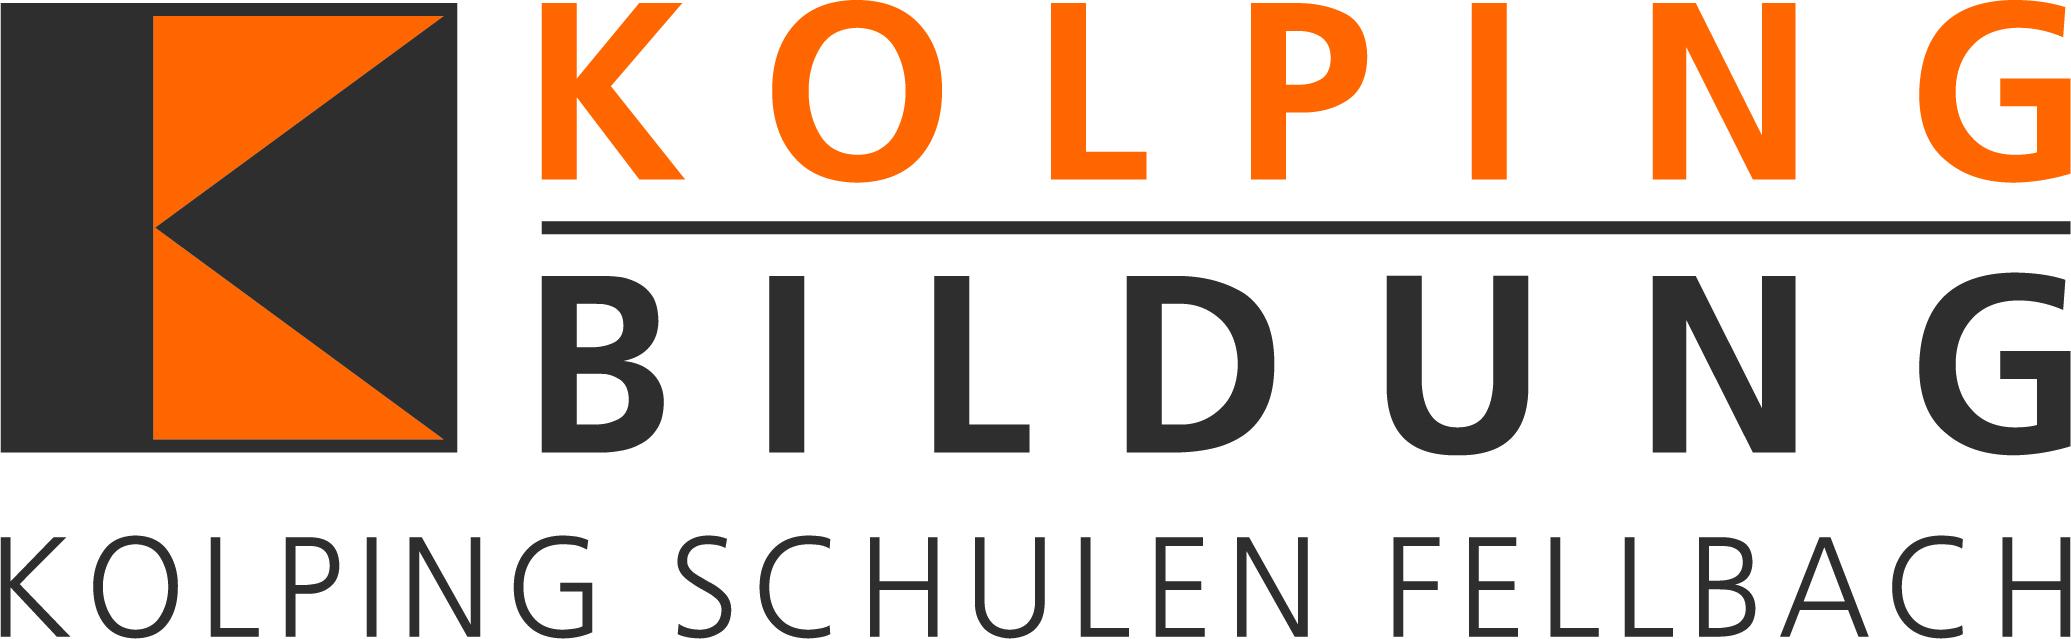 Kolping Schulen Fellbach